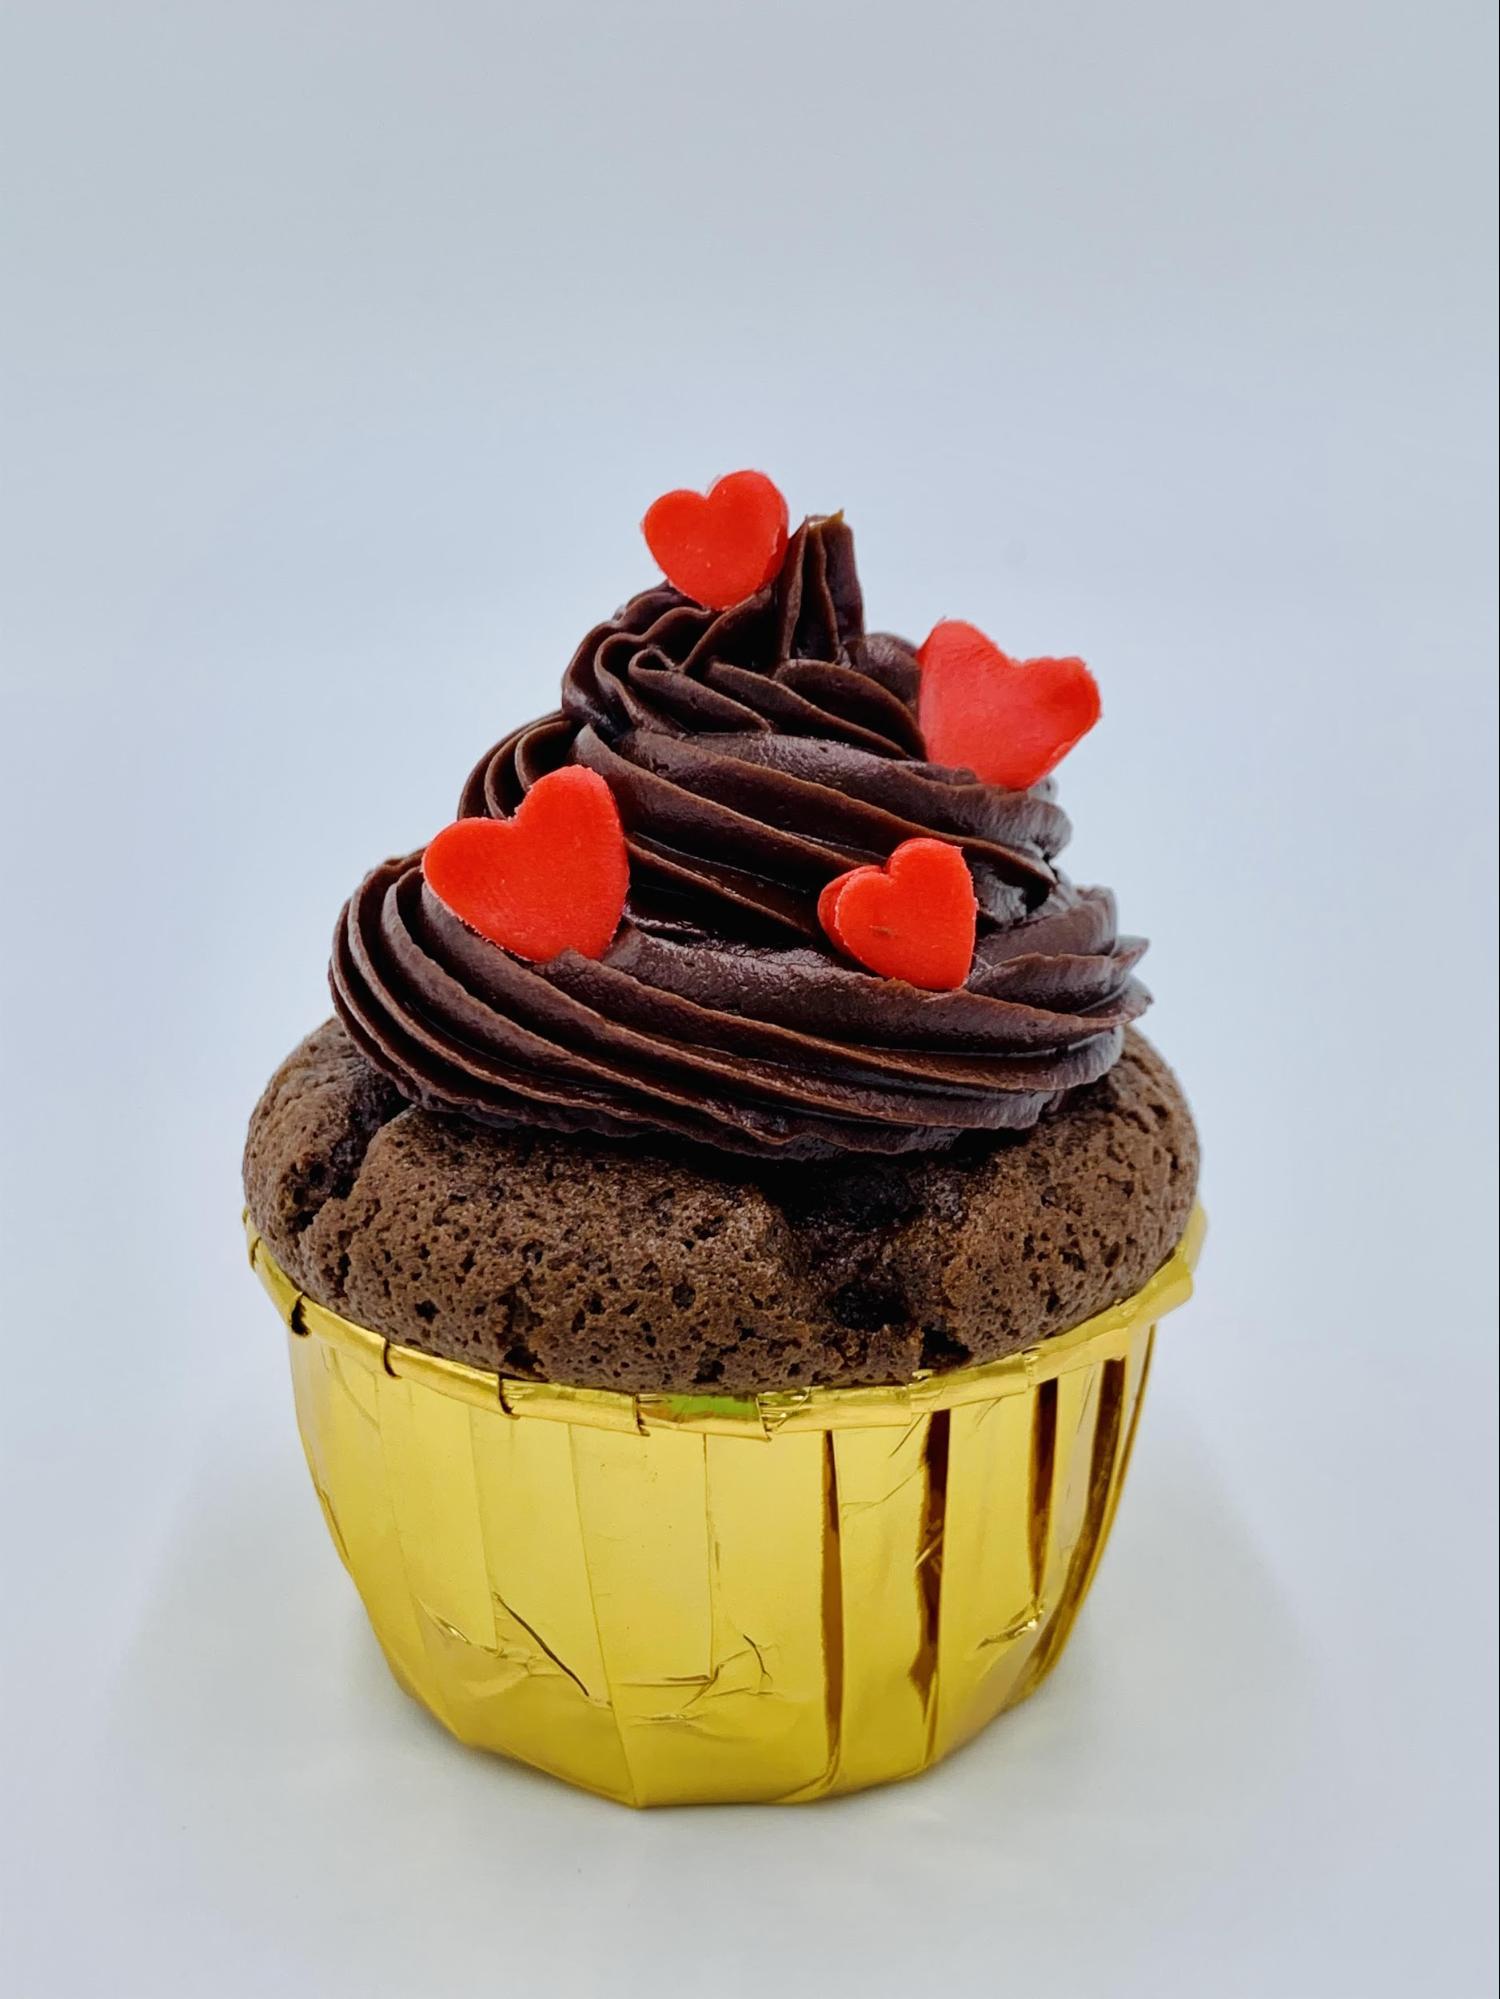 Los cupcakes de la pastelera artesana Cristina Camprubí